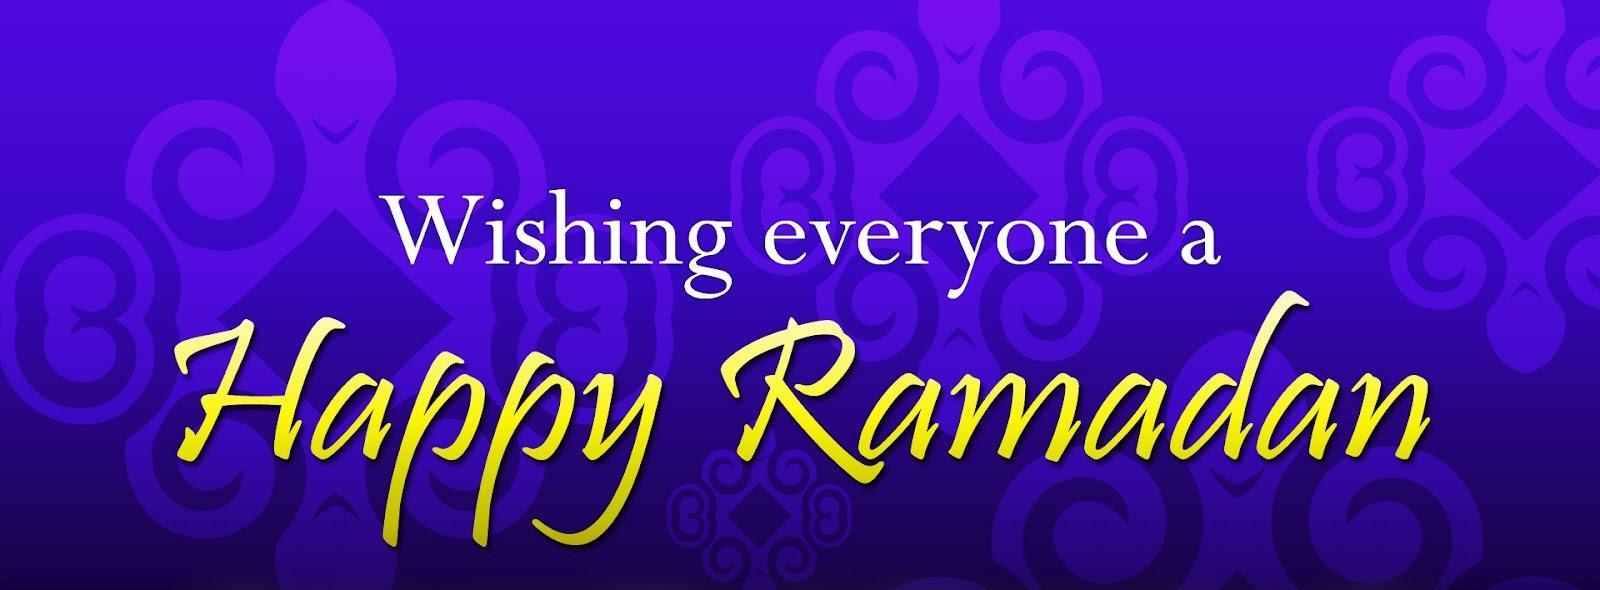 Top best 20message of ramadan ramadan wishes 2017ramadan top best 20message of ramadan ramadan wishes 2017ramadan messages 2017 kristyandbryce Choice Image